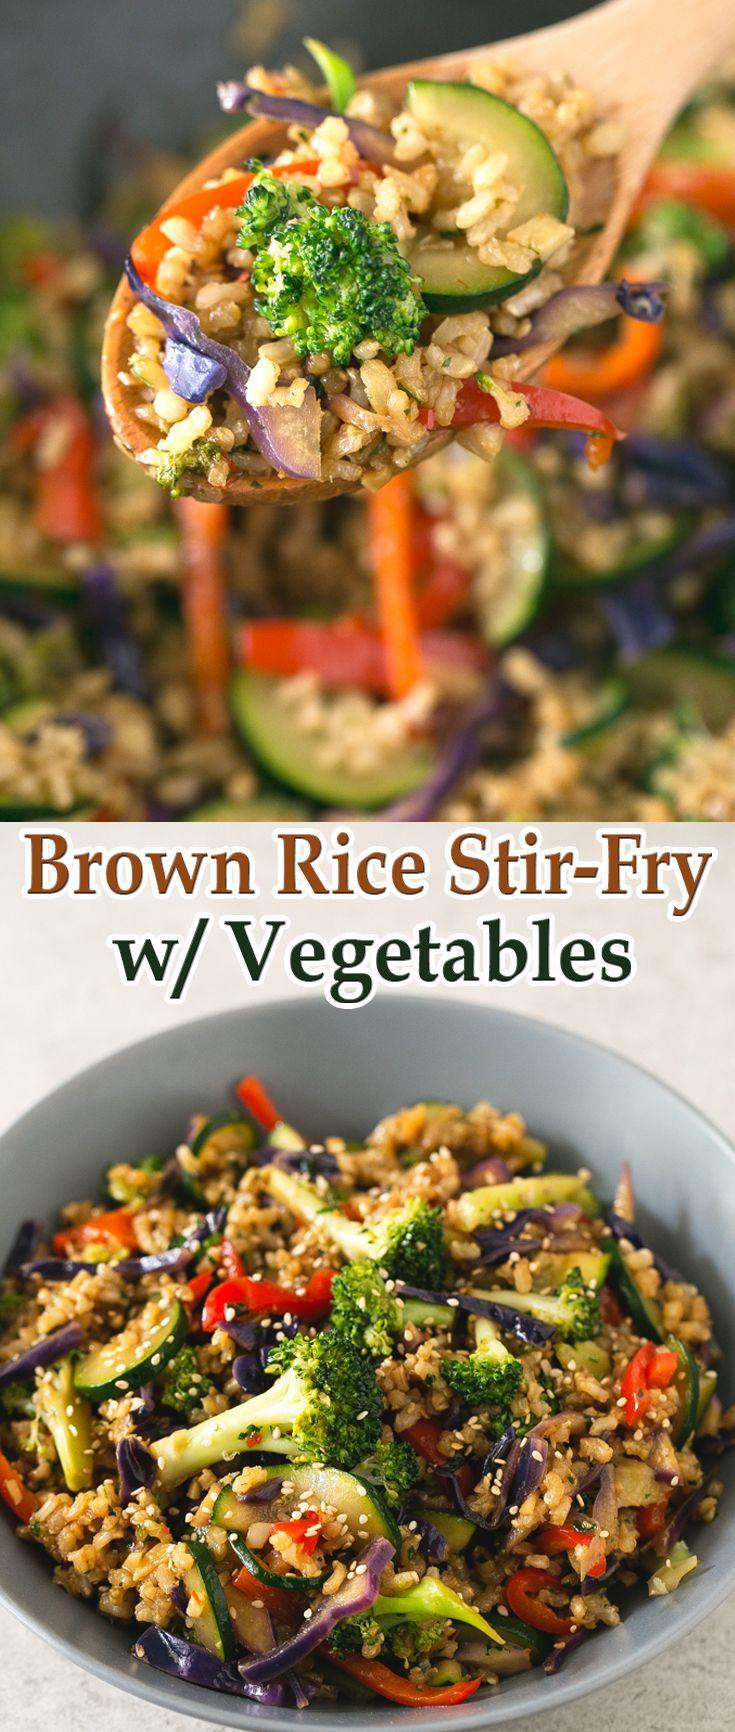 Brown Rice Stir-Fry with Vegetables